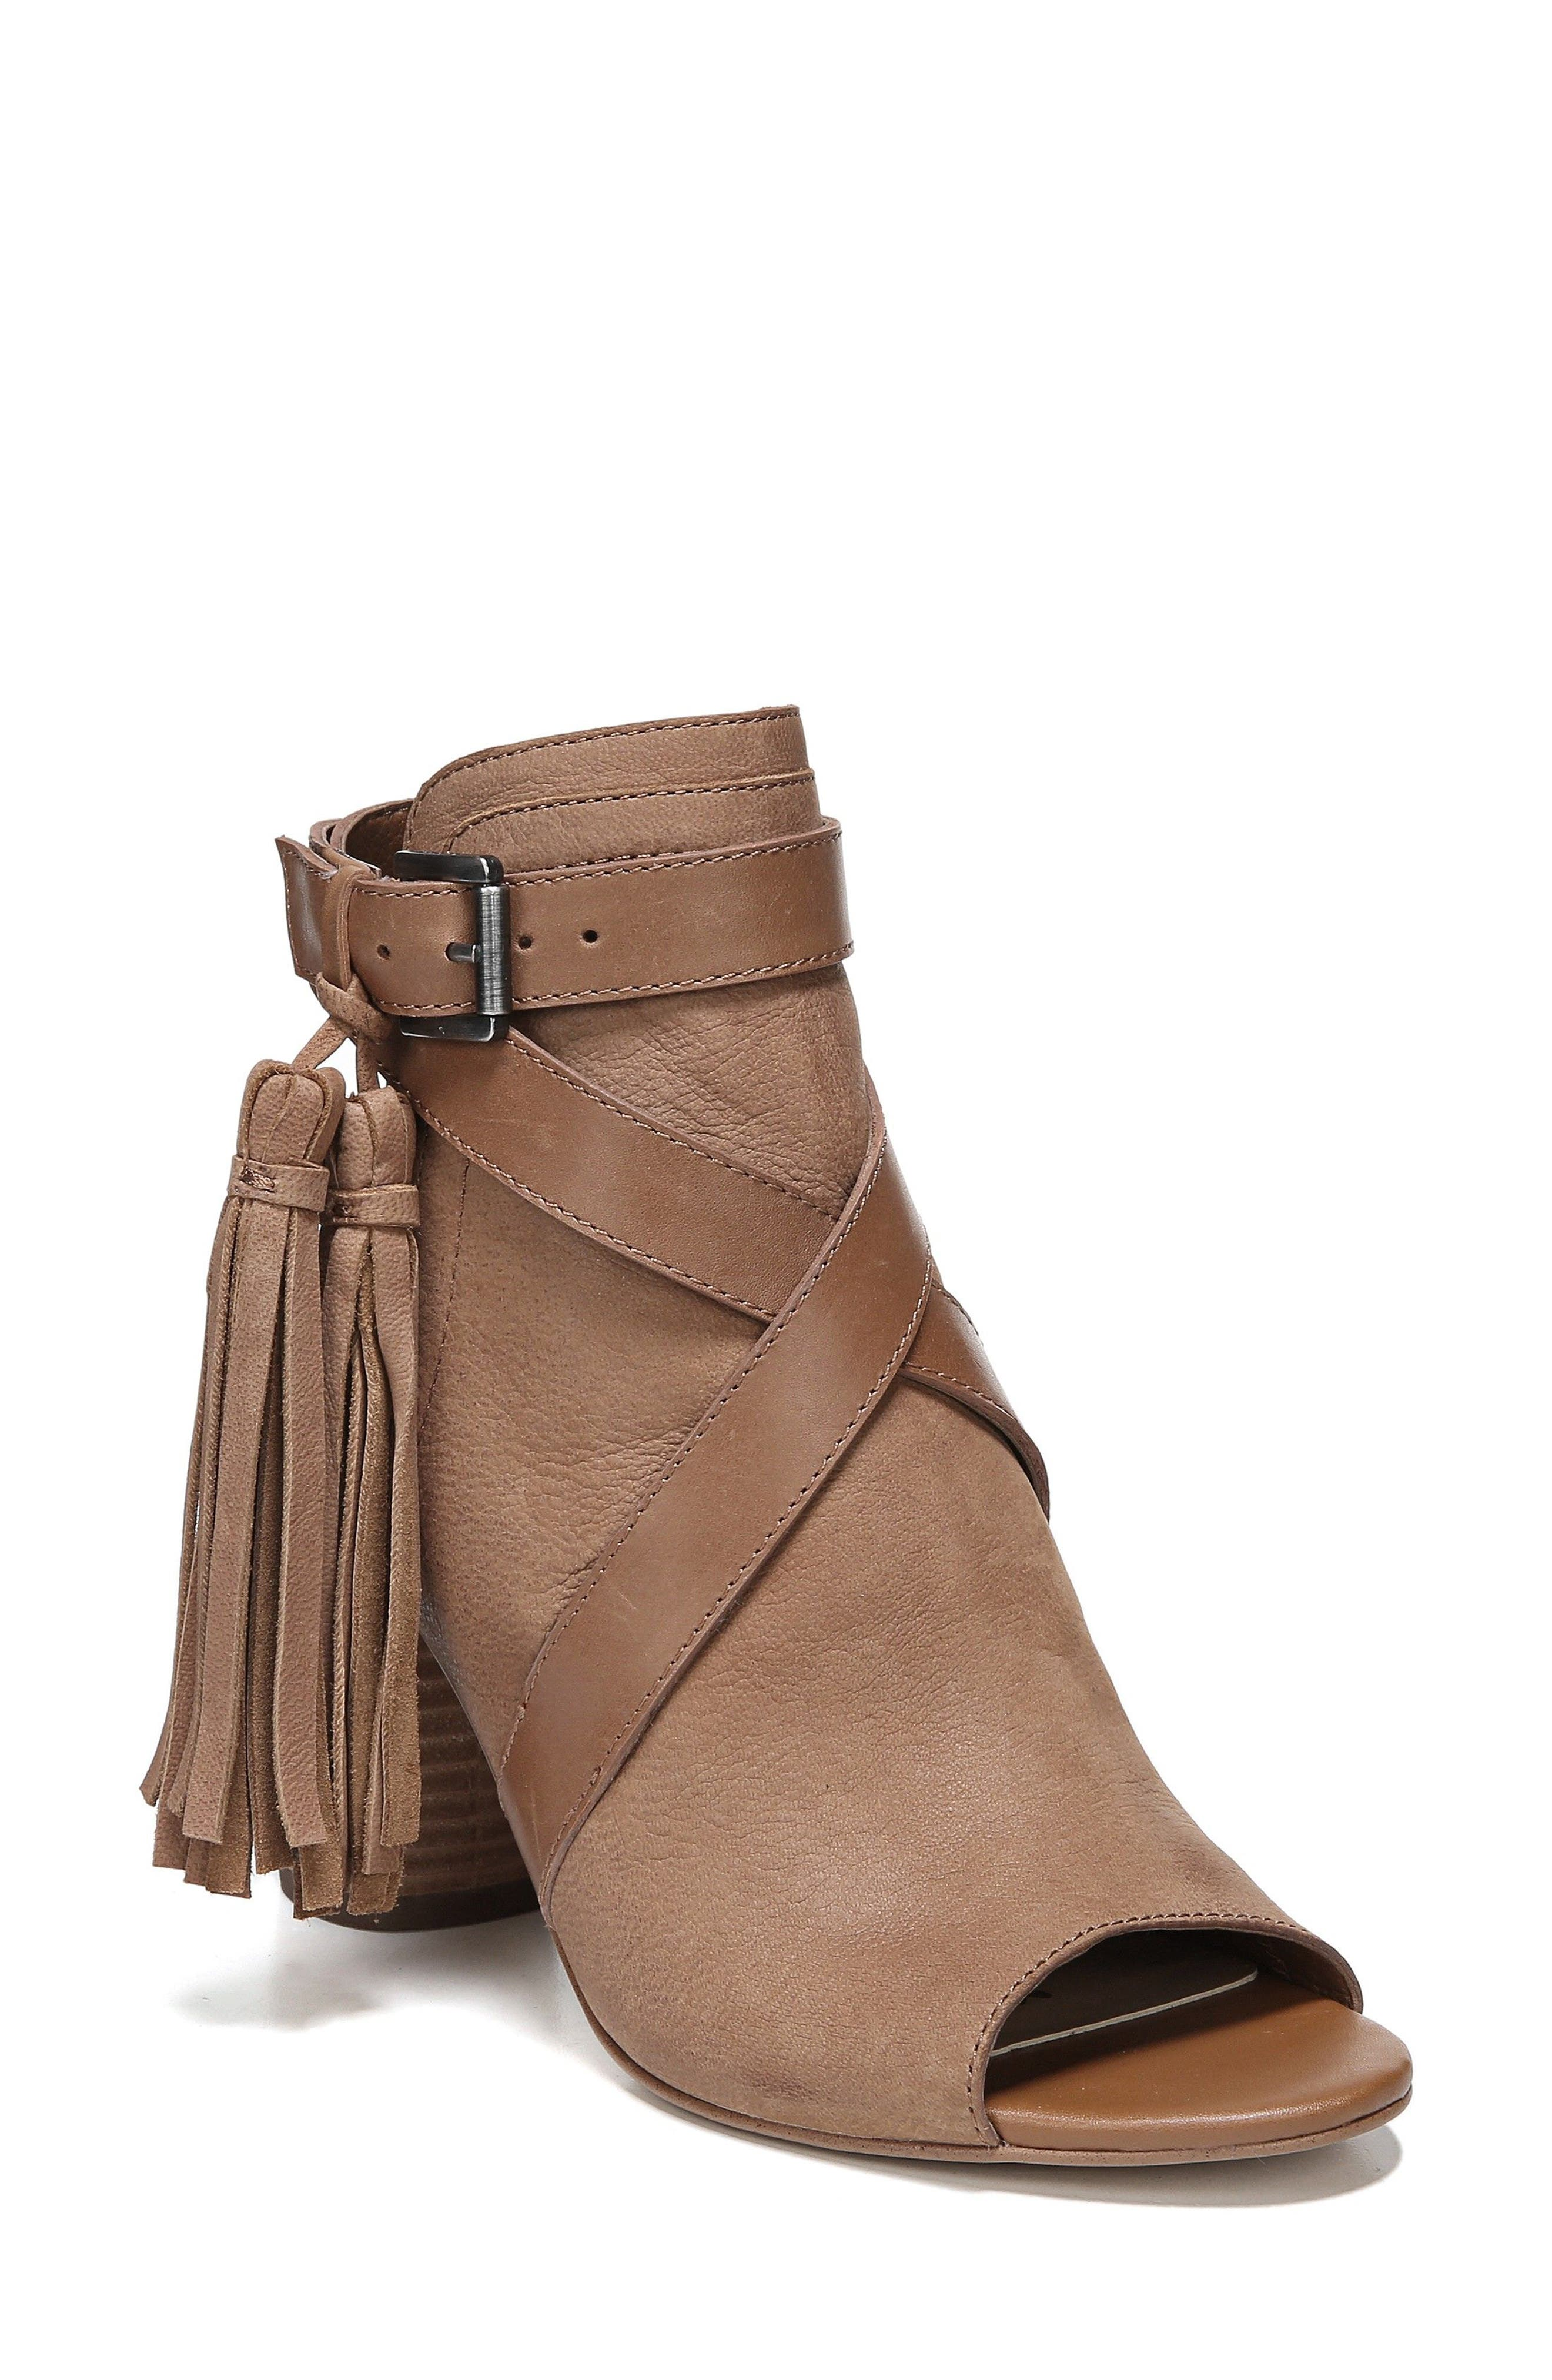 SAM EDELMAN Vermont Block Heel Sandal